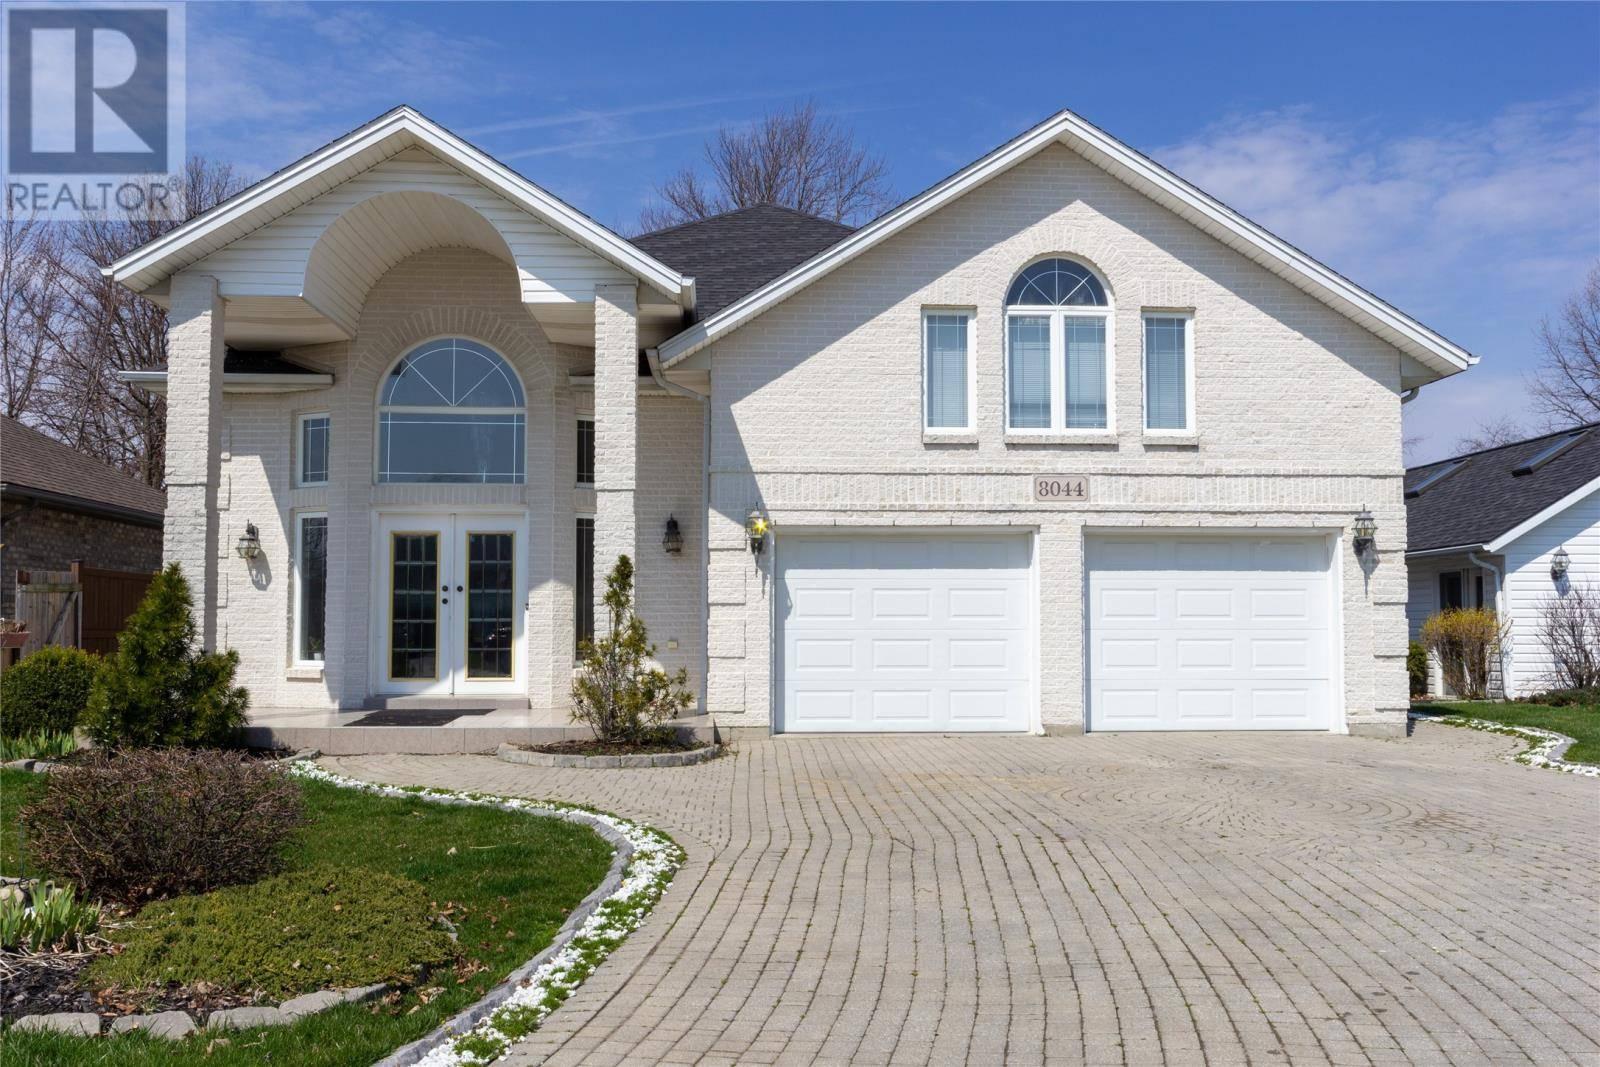 House for sale at 8044 Gardiner Cres Amherstburg Ontario - MLS: 20004563